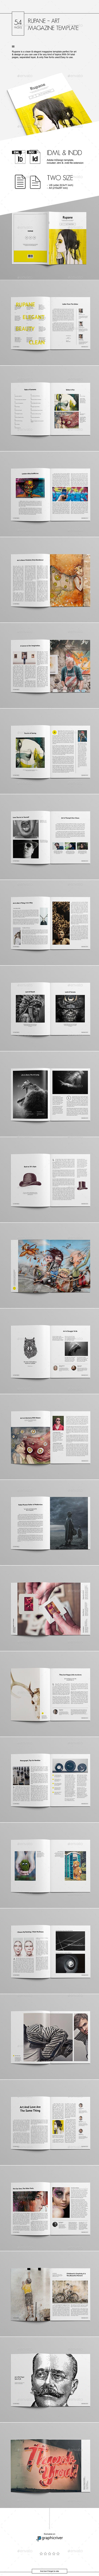 Rupane Art Magazine Template - Magazines Print Templates